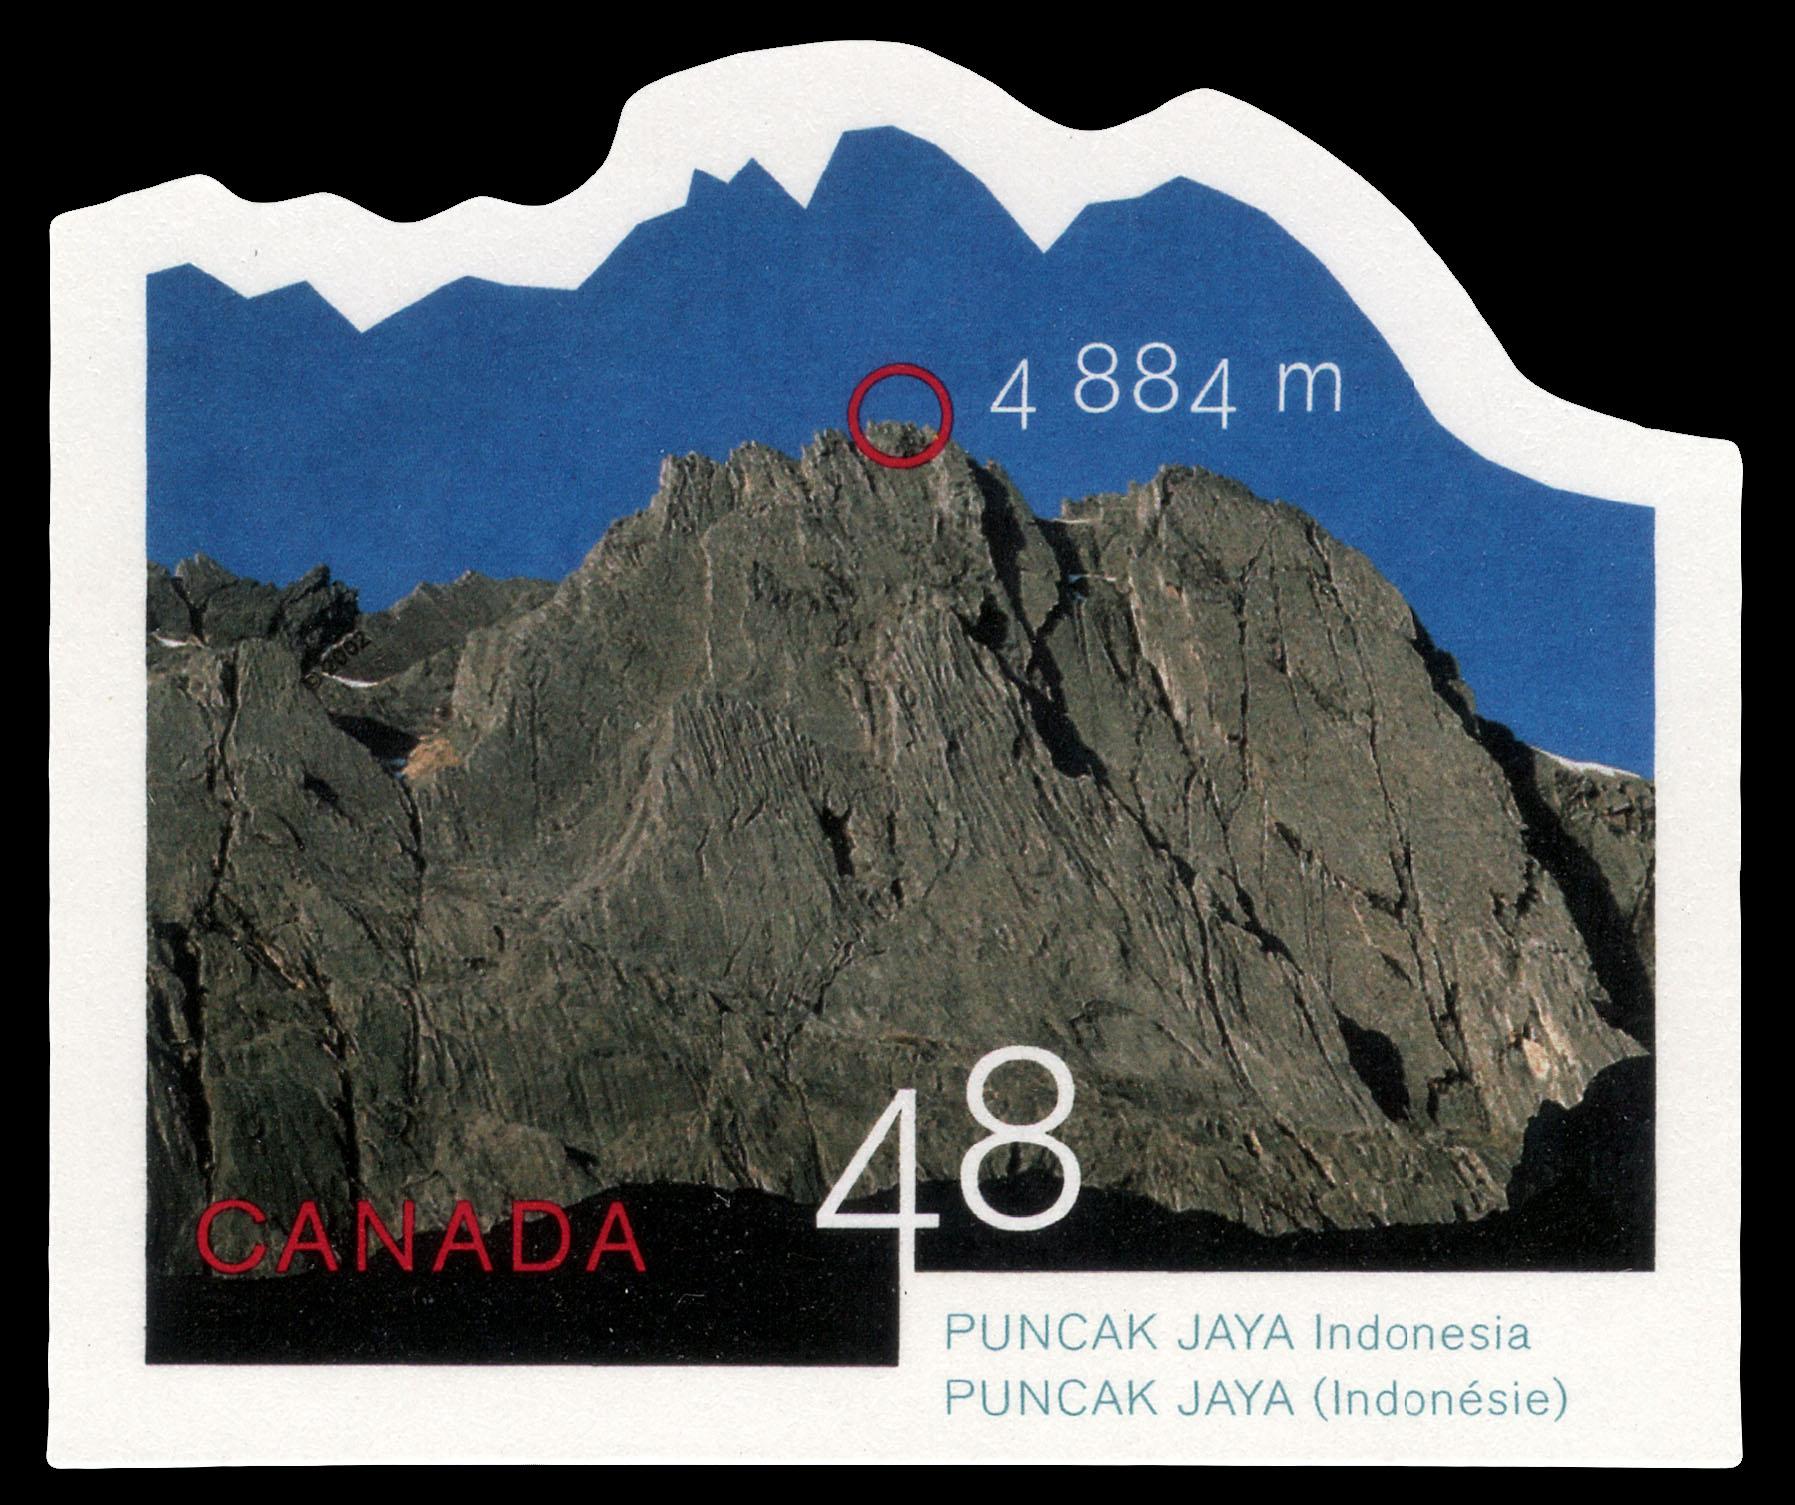 Puncak Jaya, Indonesia, 4,884 m Canada Postage Stamp | Mountains